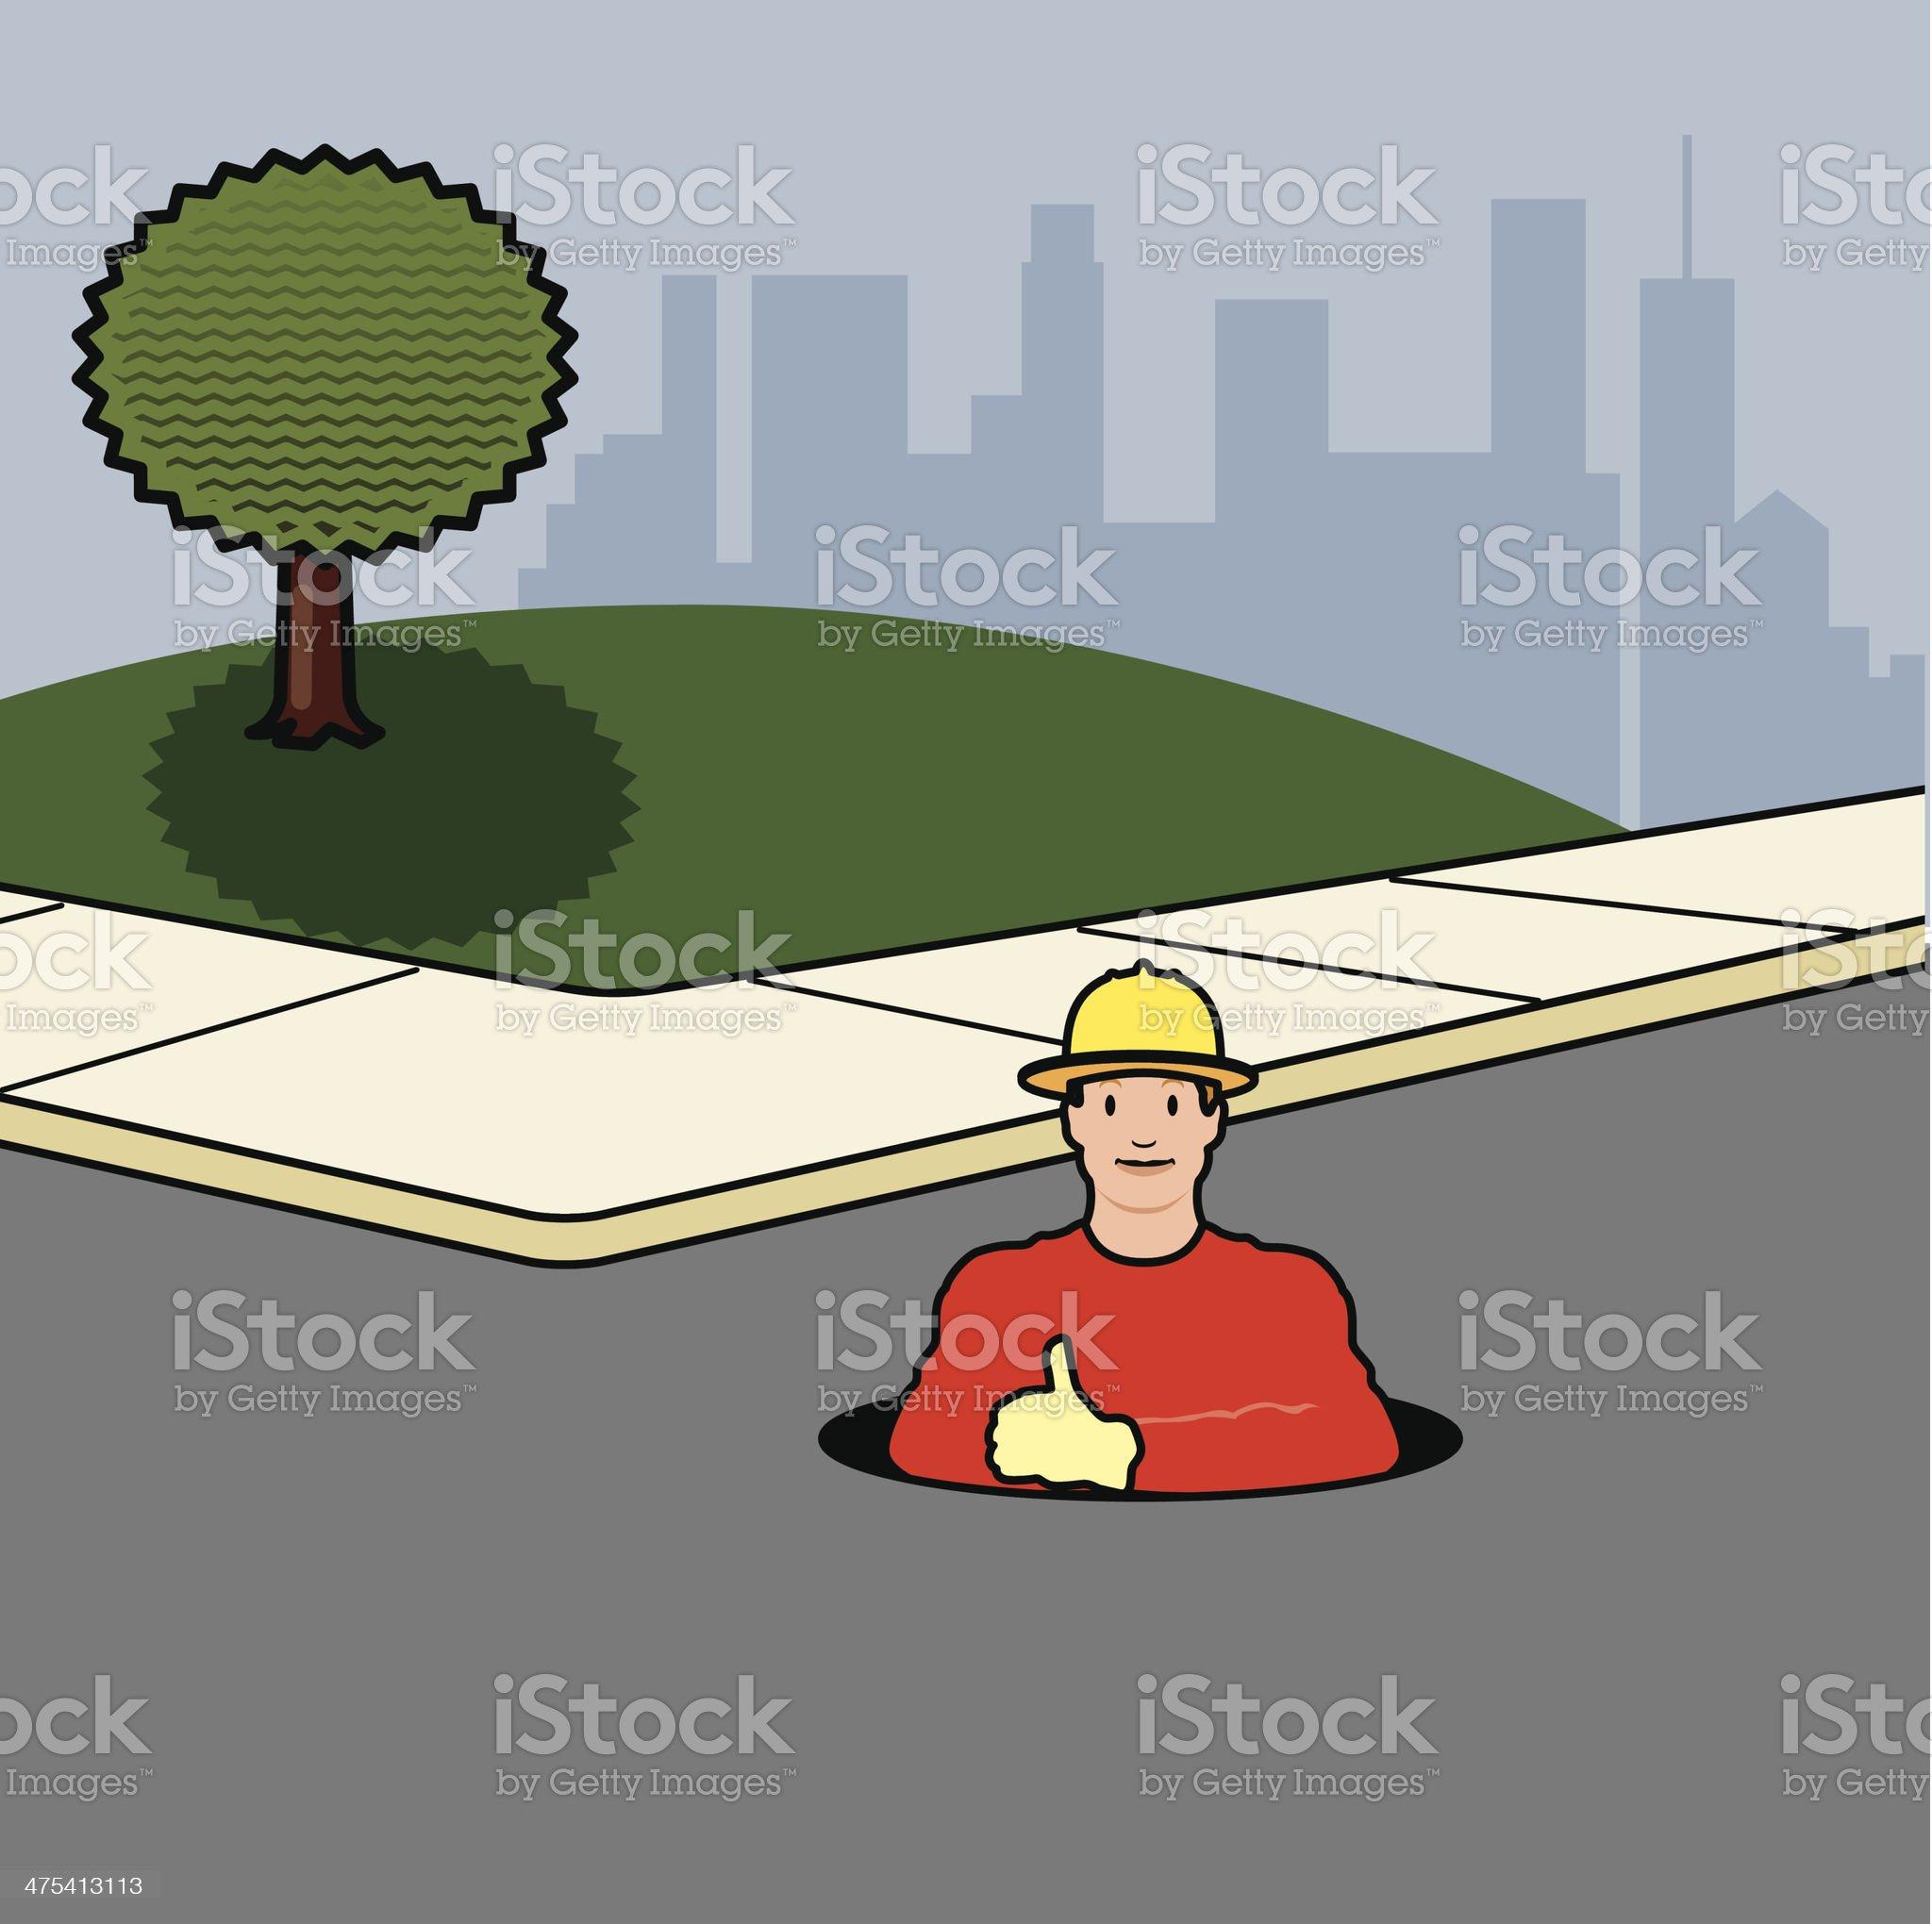 Man Manhole C royalty-free stock vector art